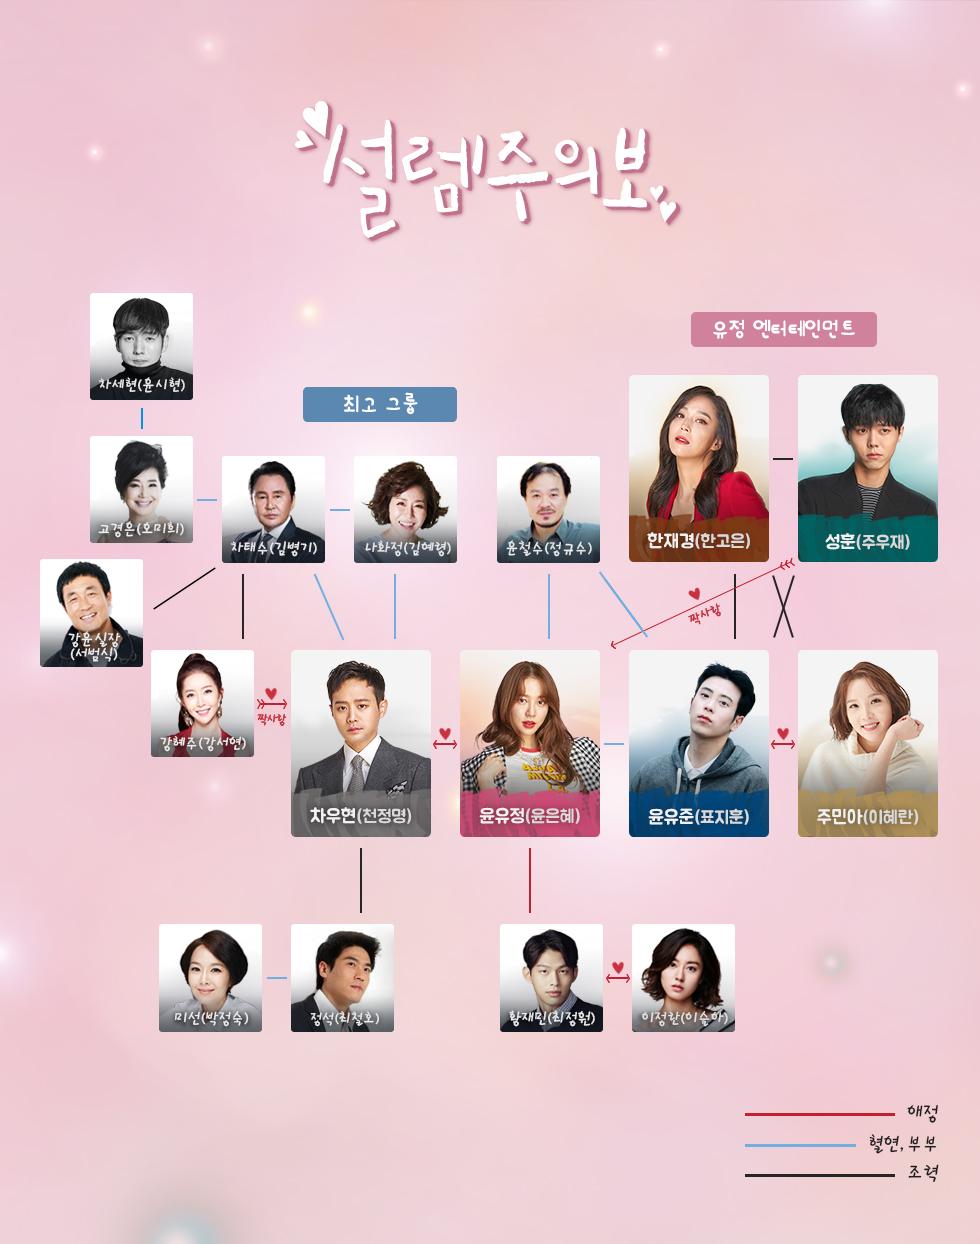 Sinopsis Drama Fluttering Warning - Info Korea 4 You